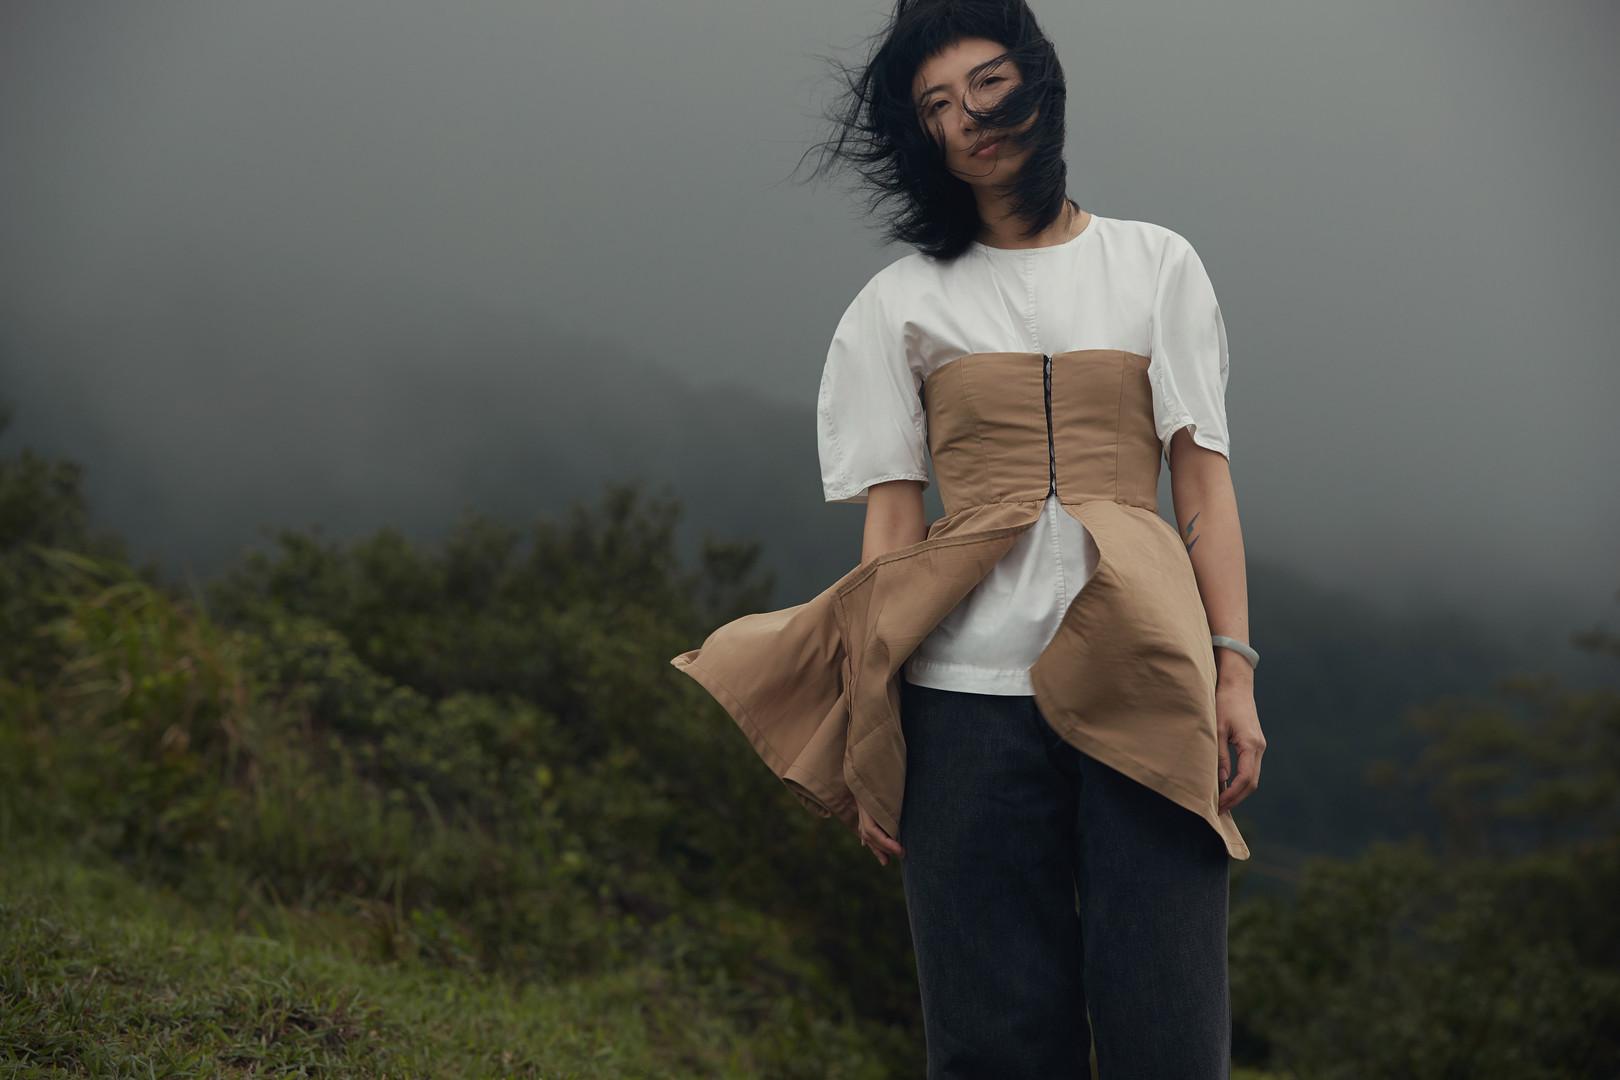 Photo by Phoebe Wong Hoi San